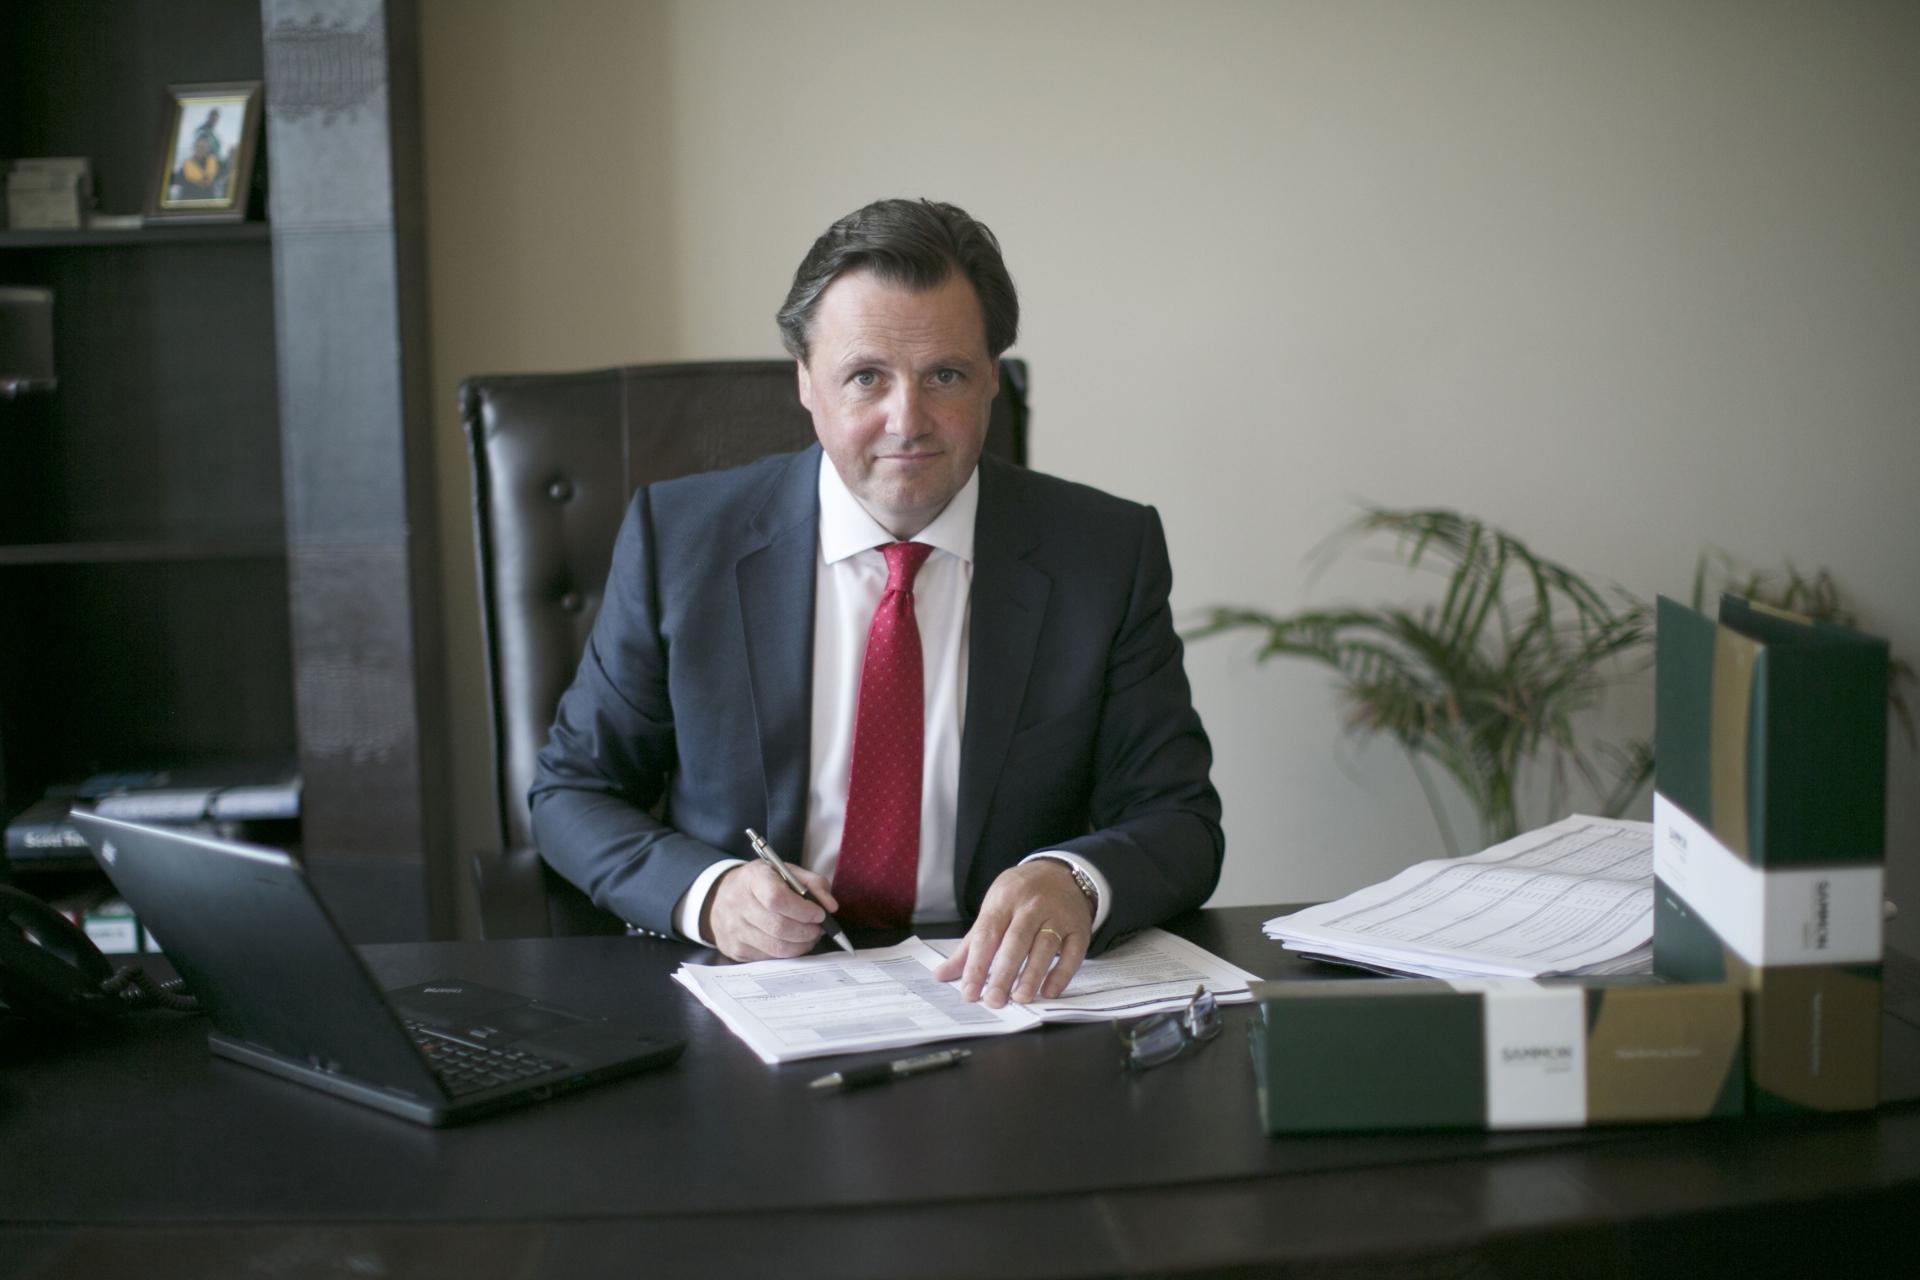 Founder and CEO of the Sammon Group Miceál Sammon